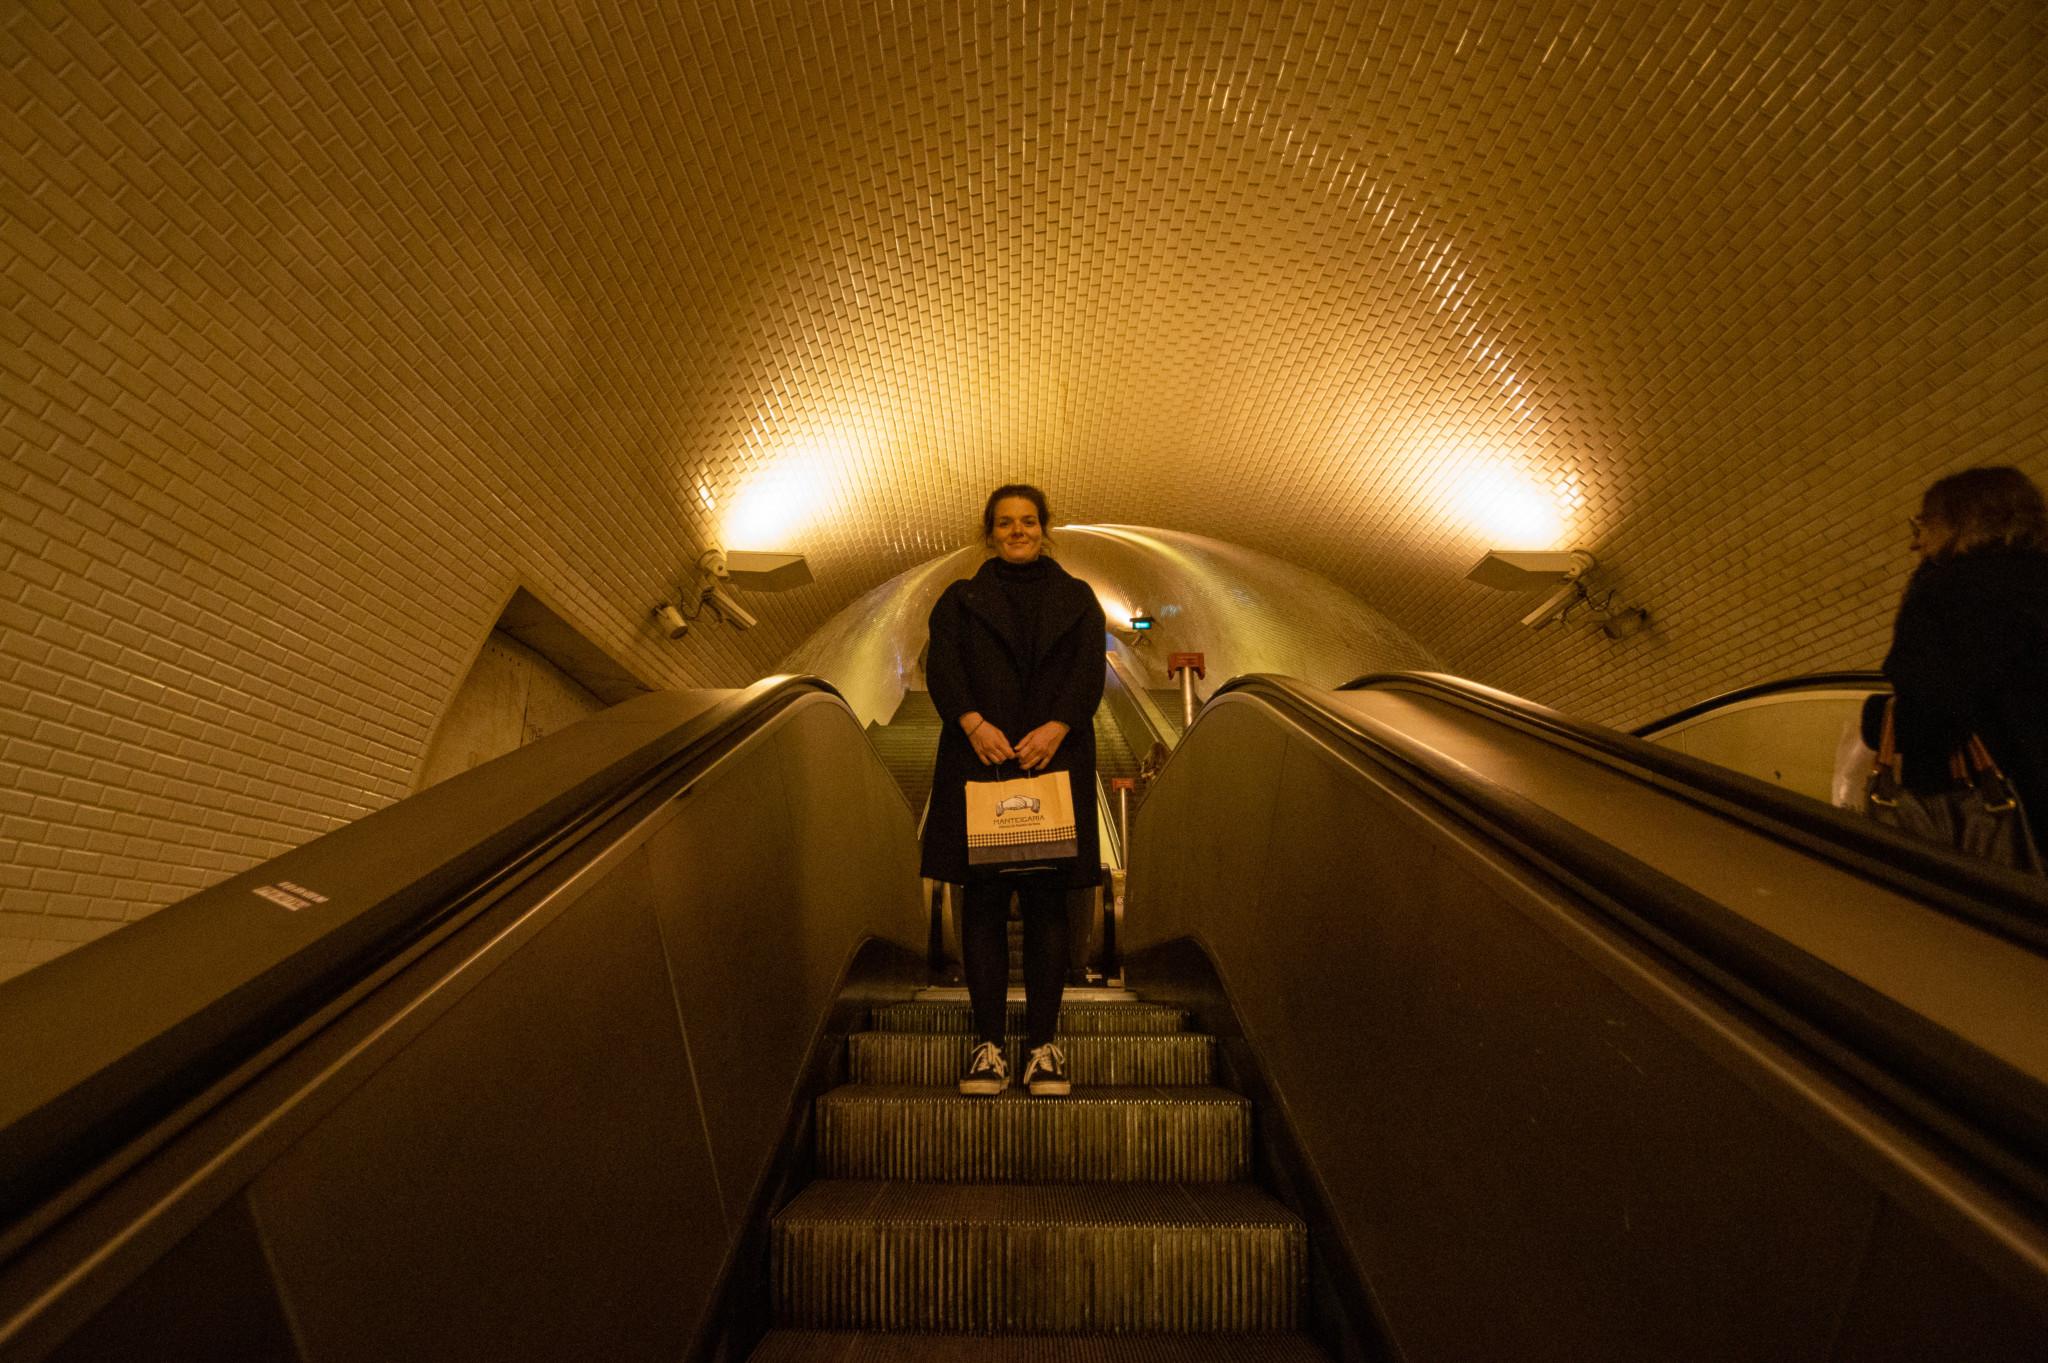 Metro fahren in Lissabon